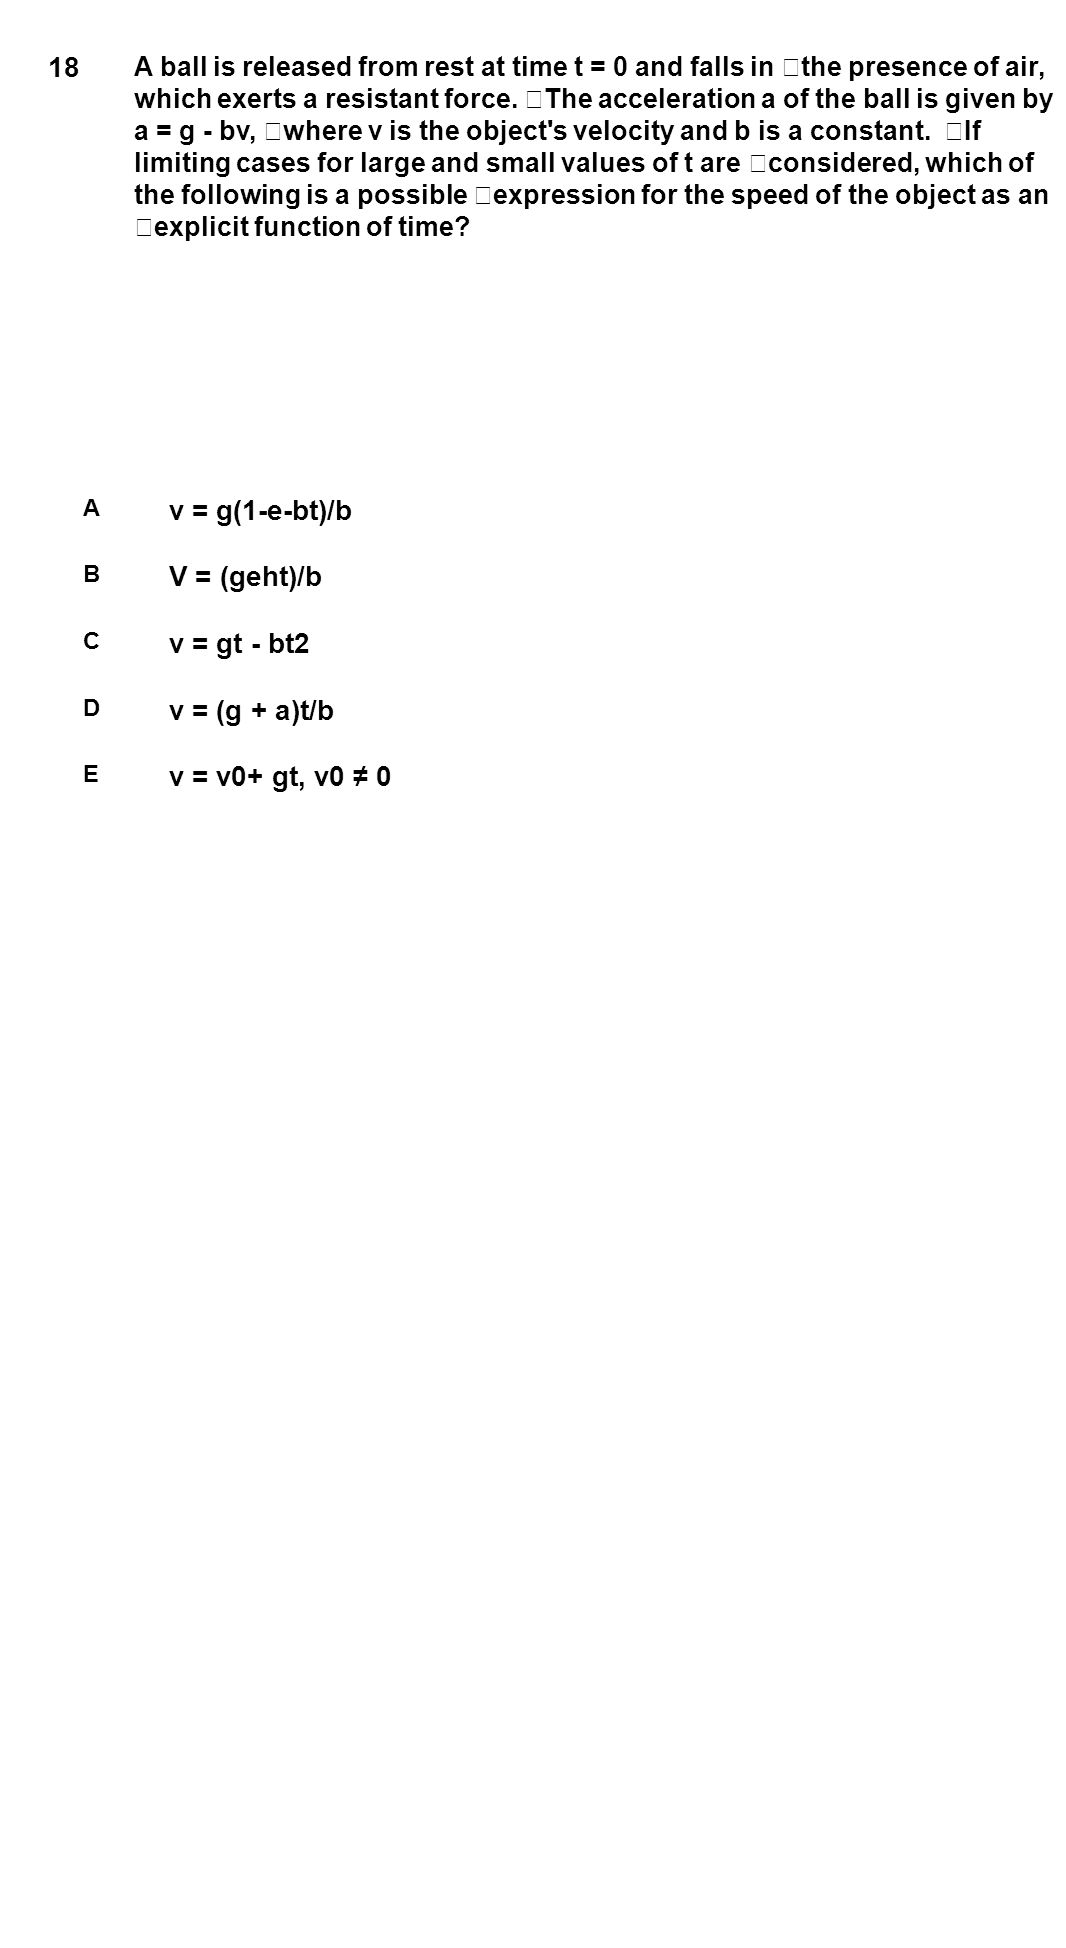 18 v = g(1-e-bt)/b V = (geht)/b v = gt - bt2 v = (g + a)t/b